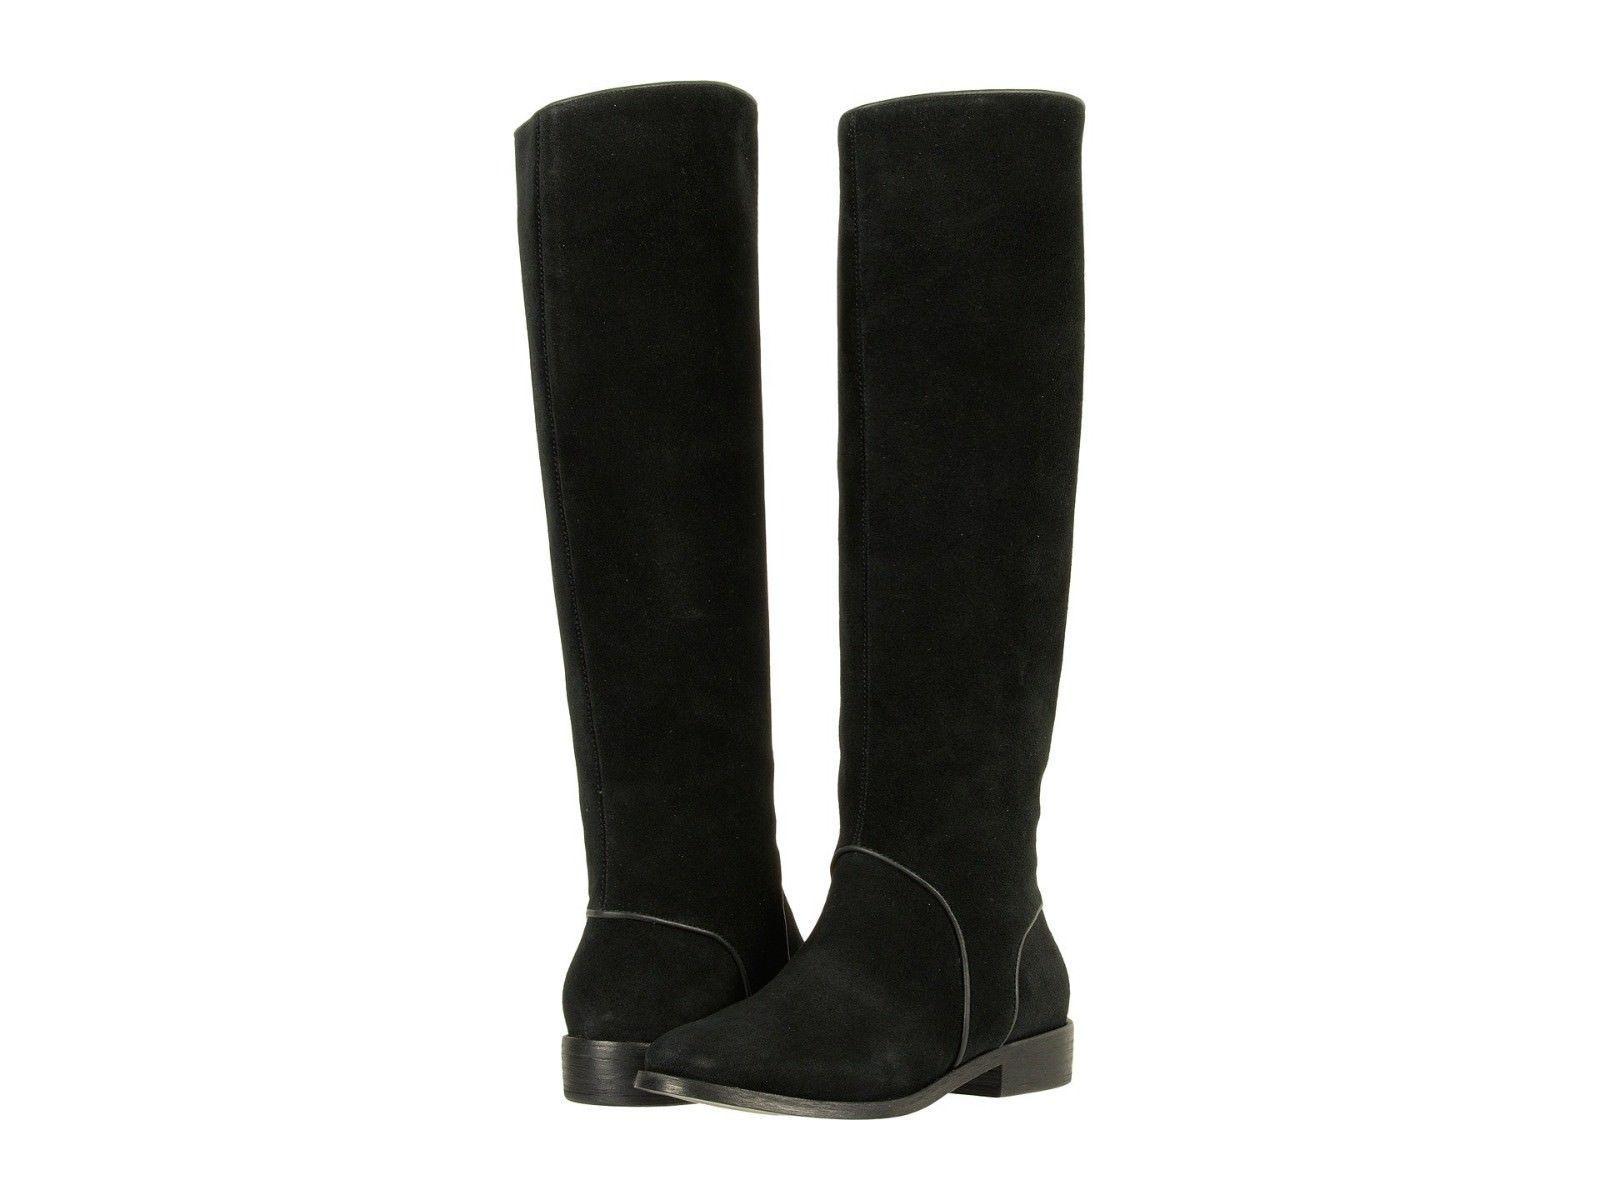 Women's UGG® Gracen Suede Block Heel Riding Boots, 1017344 Sizes 6-8.5 Black - $199.95